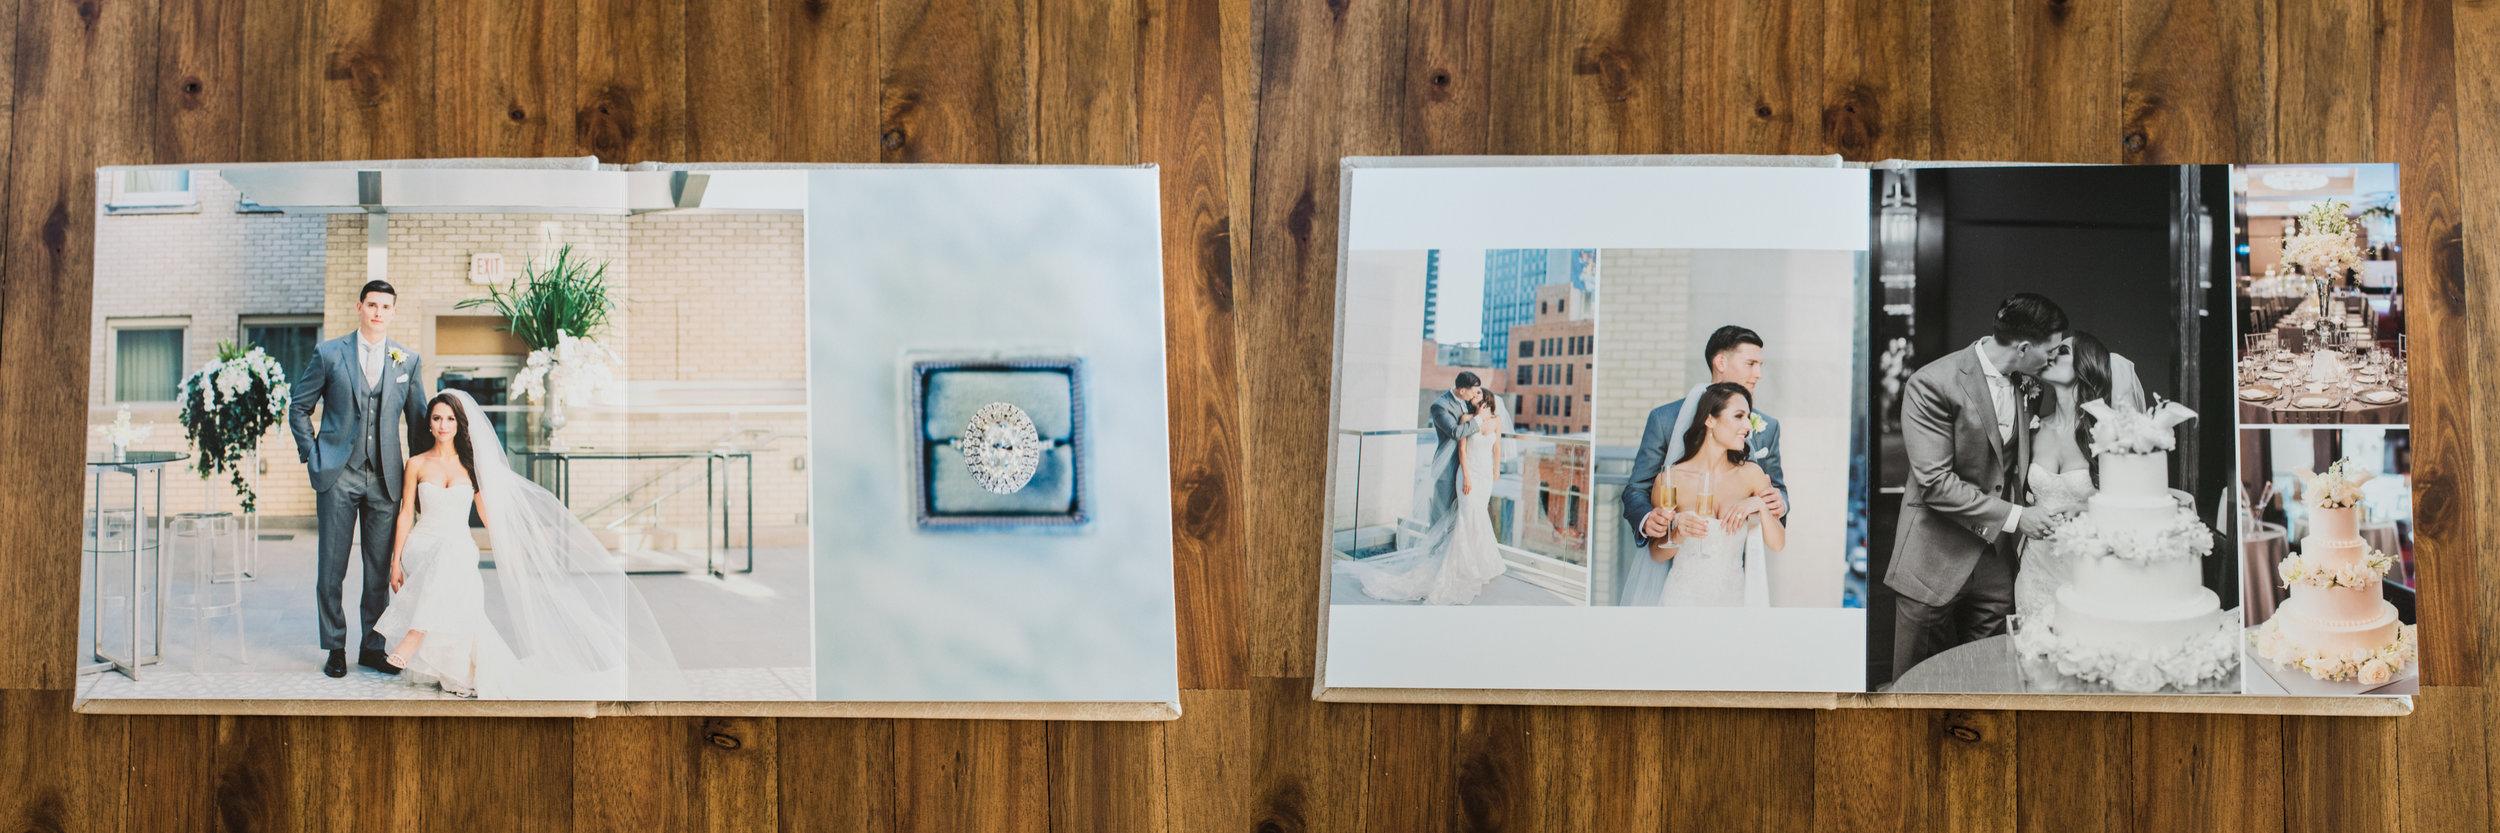 Albums-6.jpg